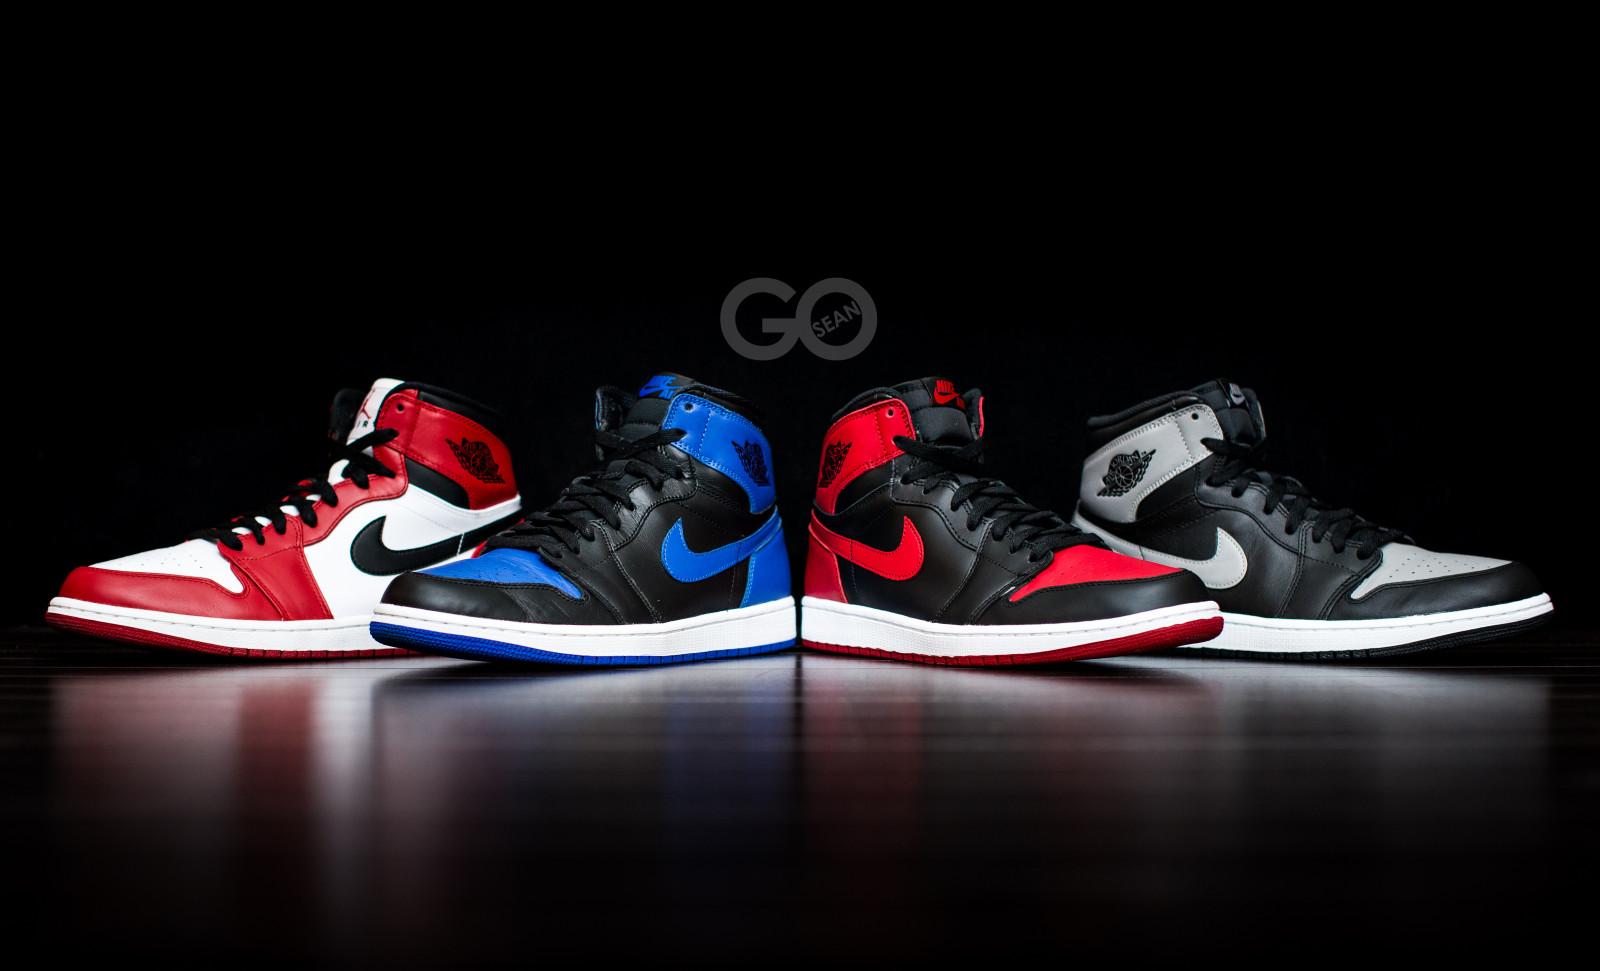 Wallpaper : blue, shadow, red, white, Chicago, basketball, Studio, 50mm, prime, grey, 1, Michael ...